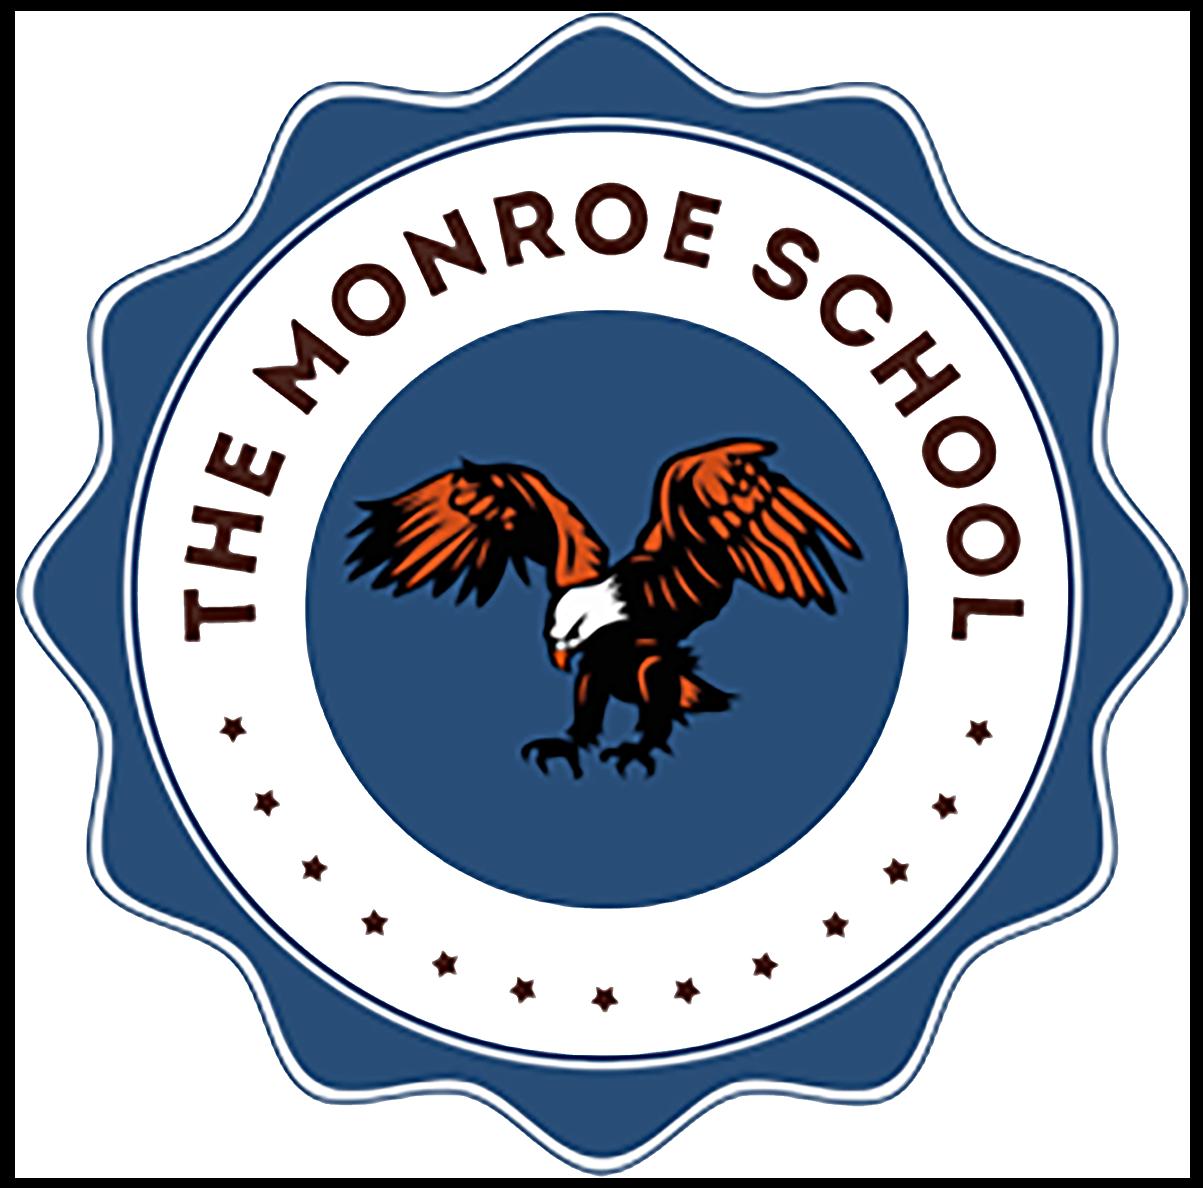 The Monroe School